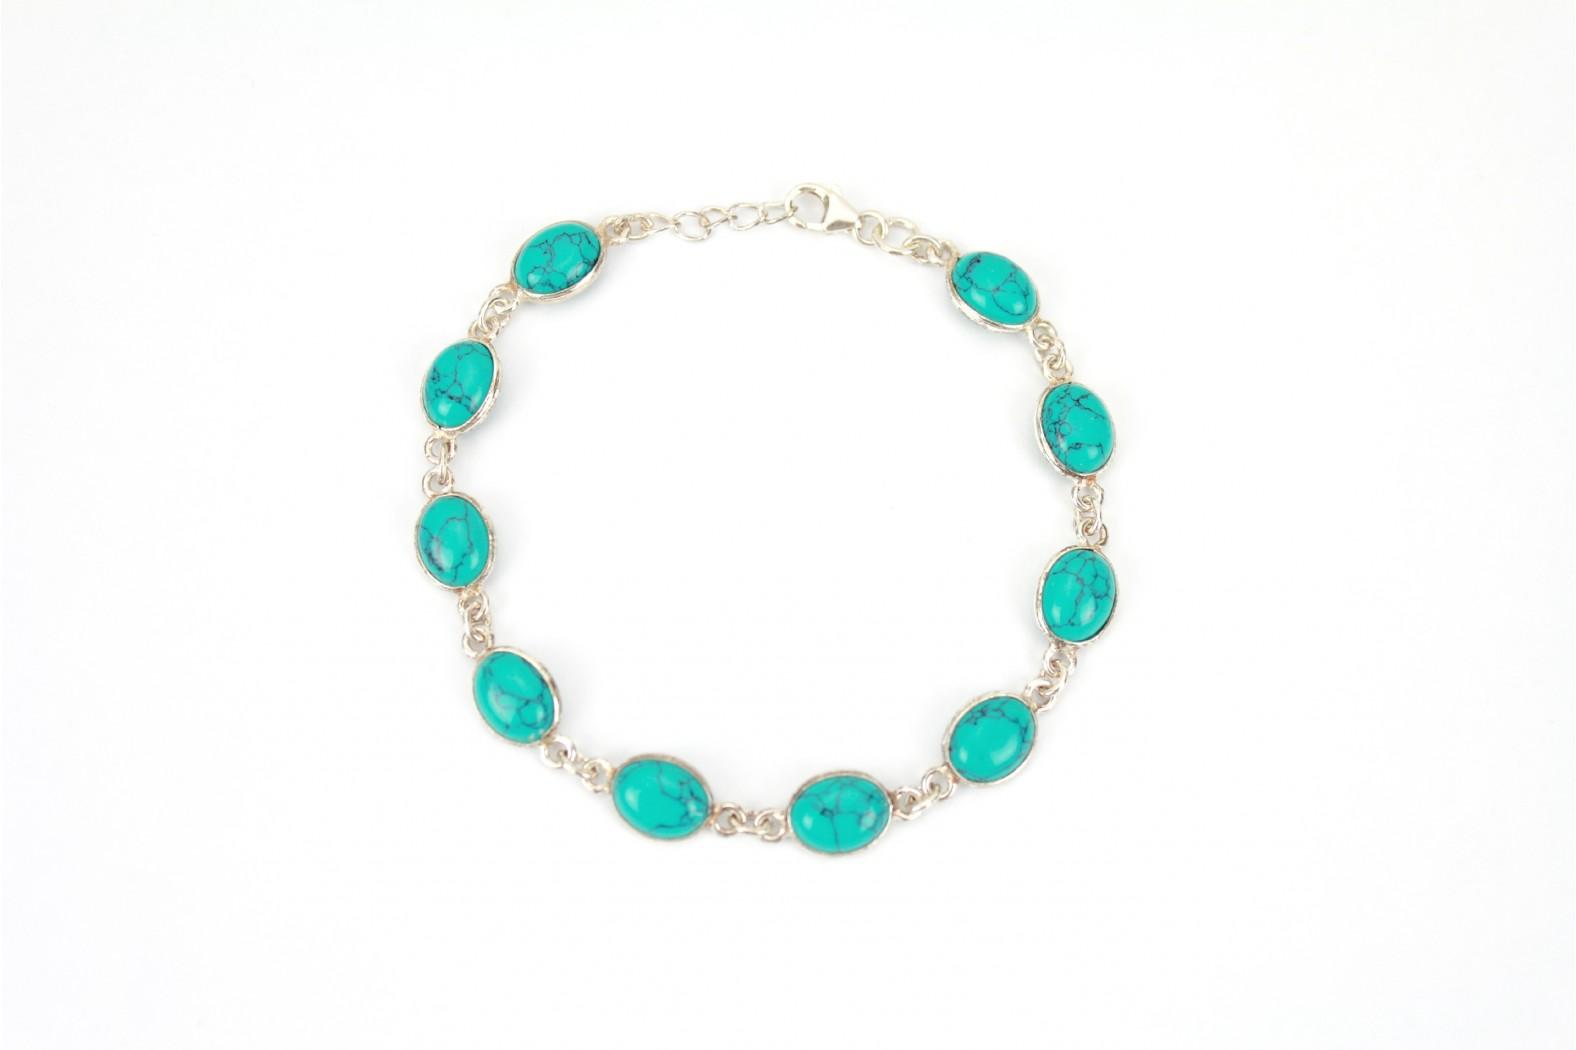 Turquoise 10 stone silver set claw clasp Bracelet